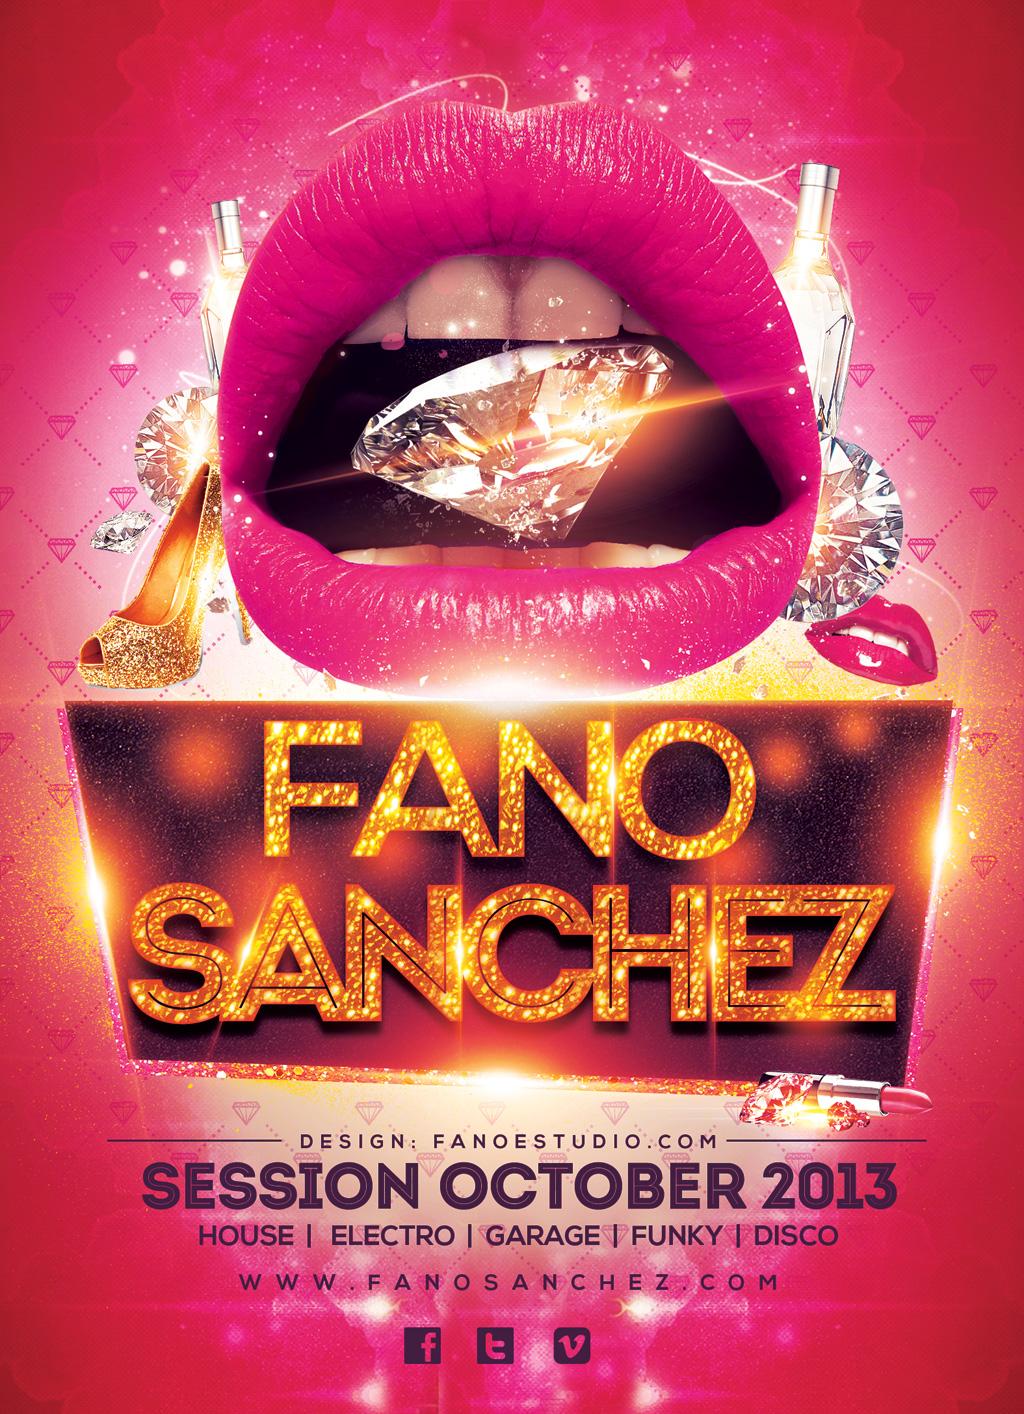 Fano Sanchez Session October 2013